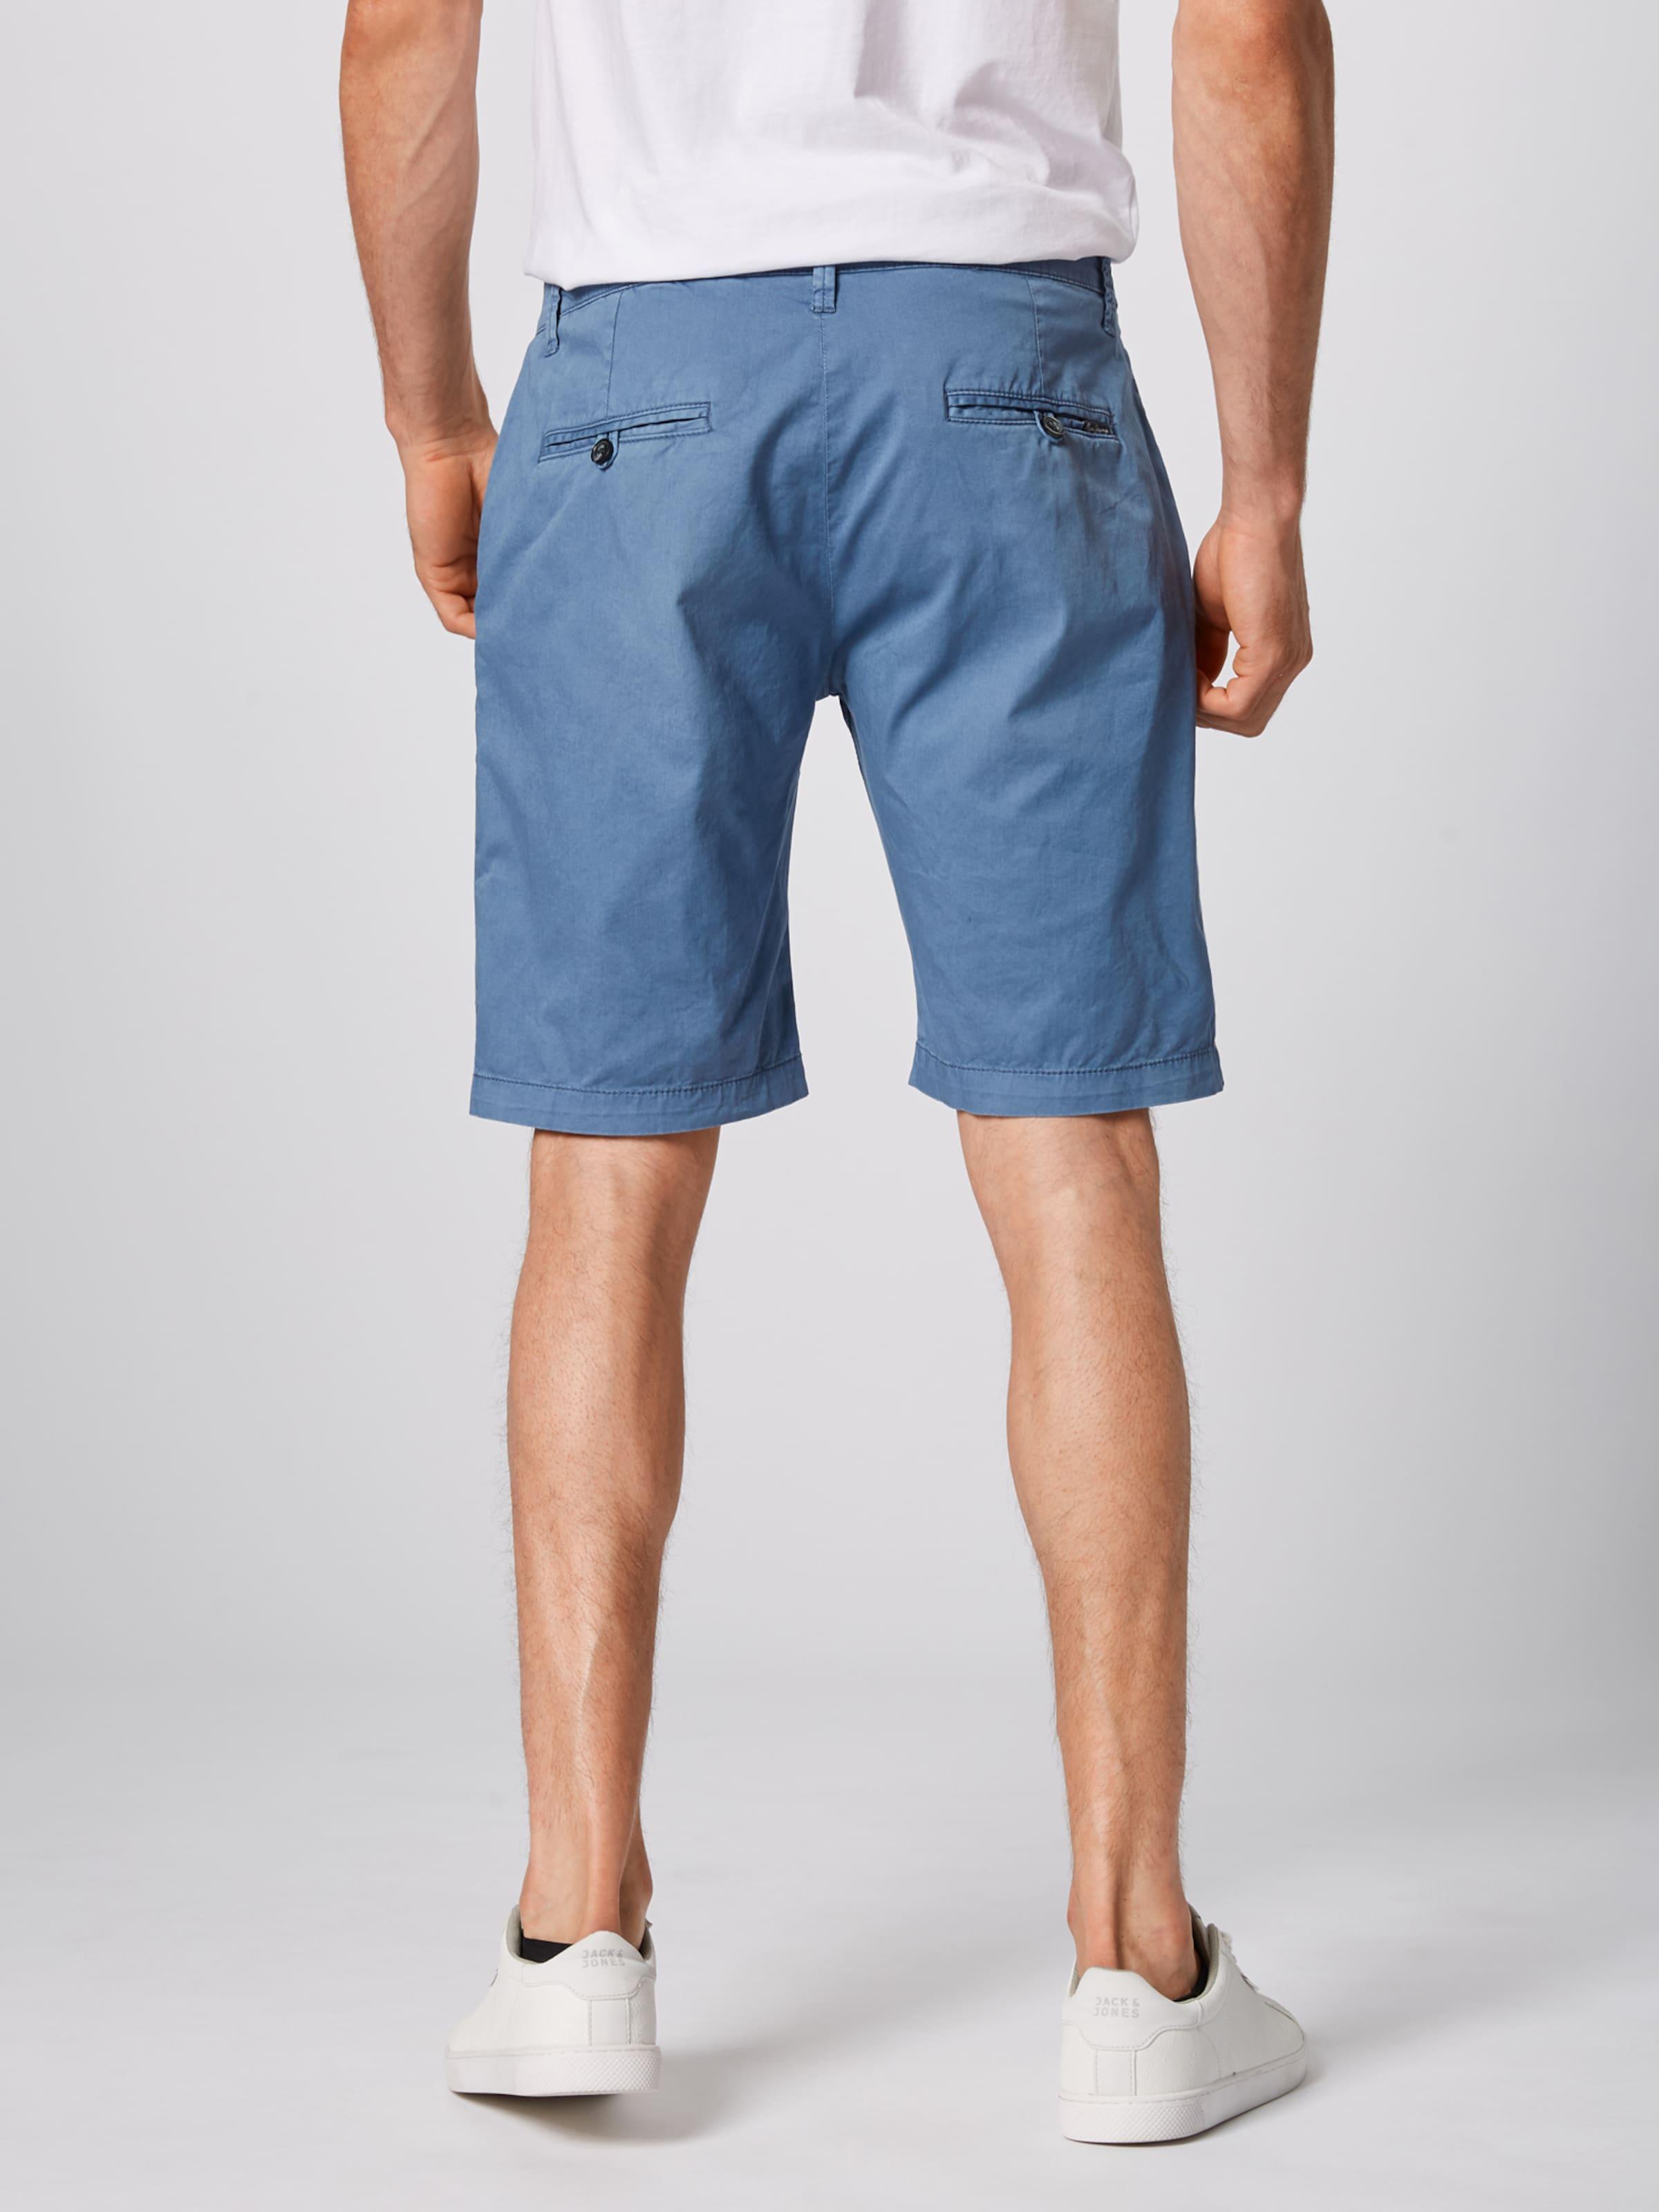 Shorts Blau Pepe 'mc Jeans In Queen' fgYvI7yb6